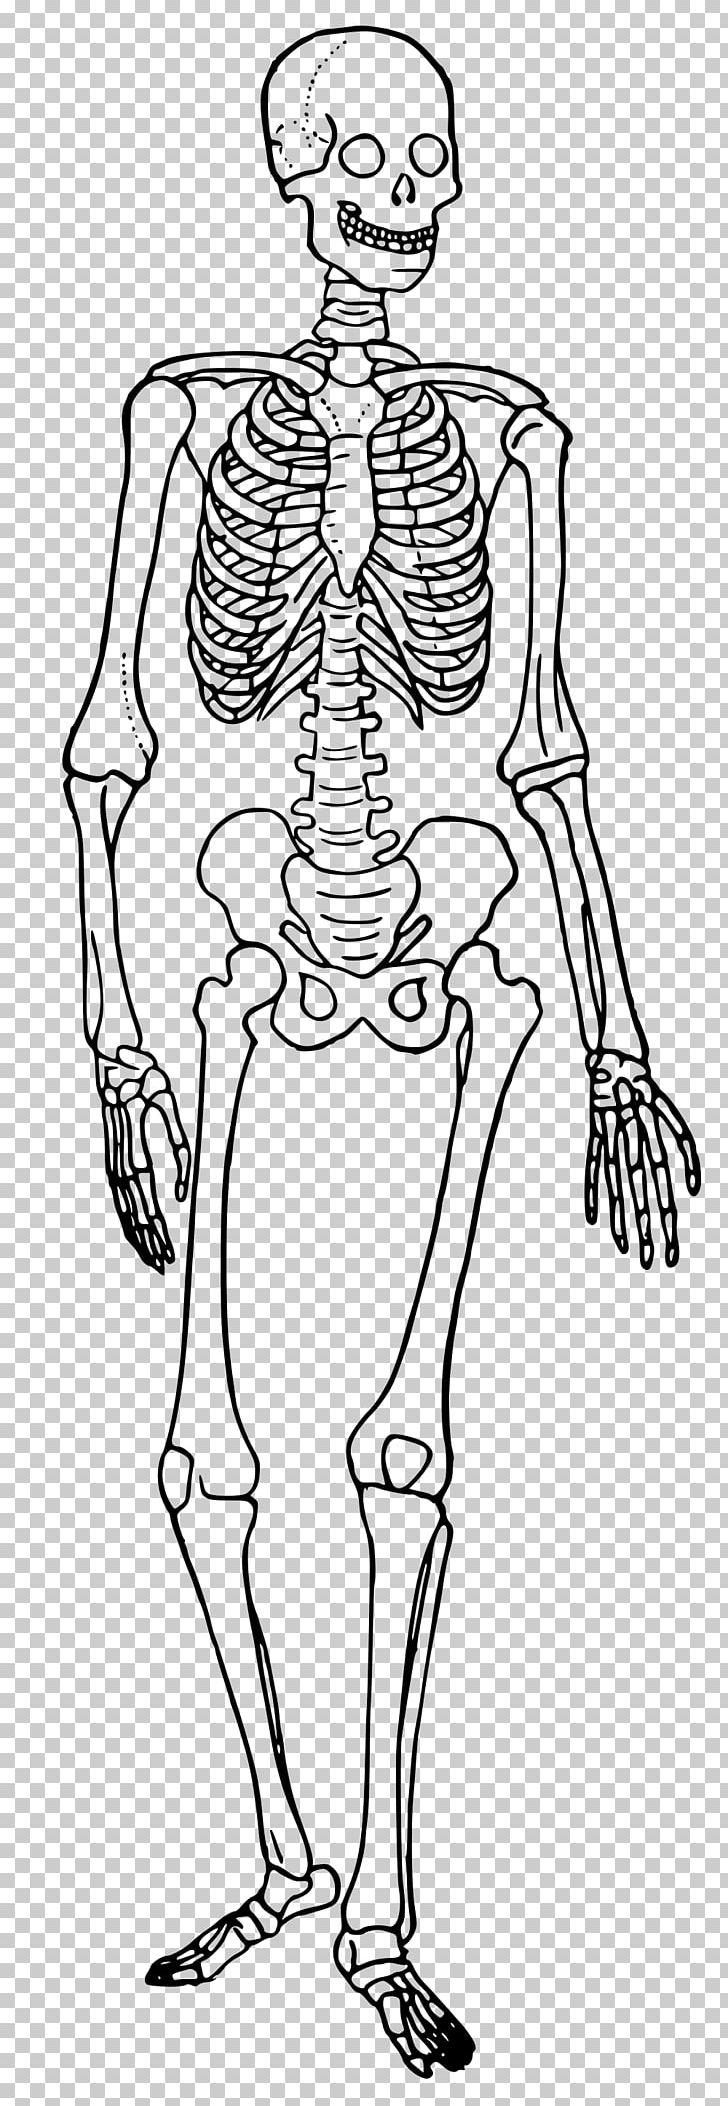 medium resolution of the skeletal system human skeleton human body diagram bone png clipart anatomy arm art